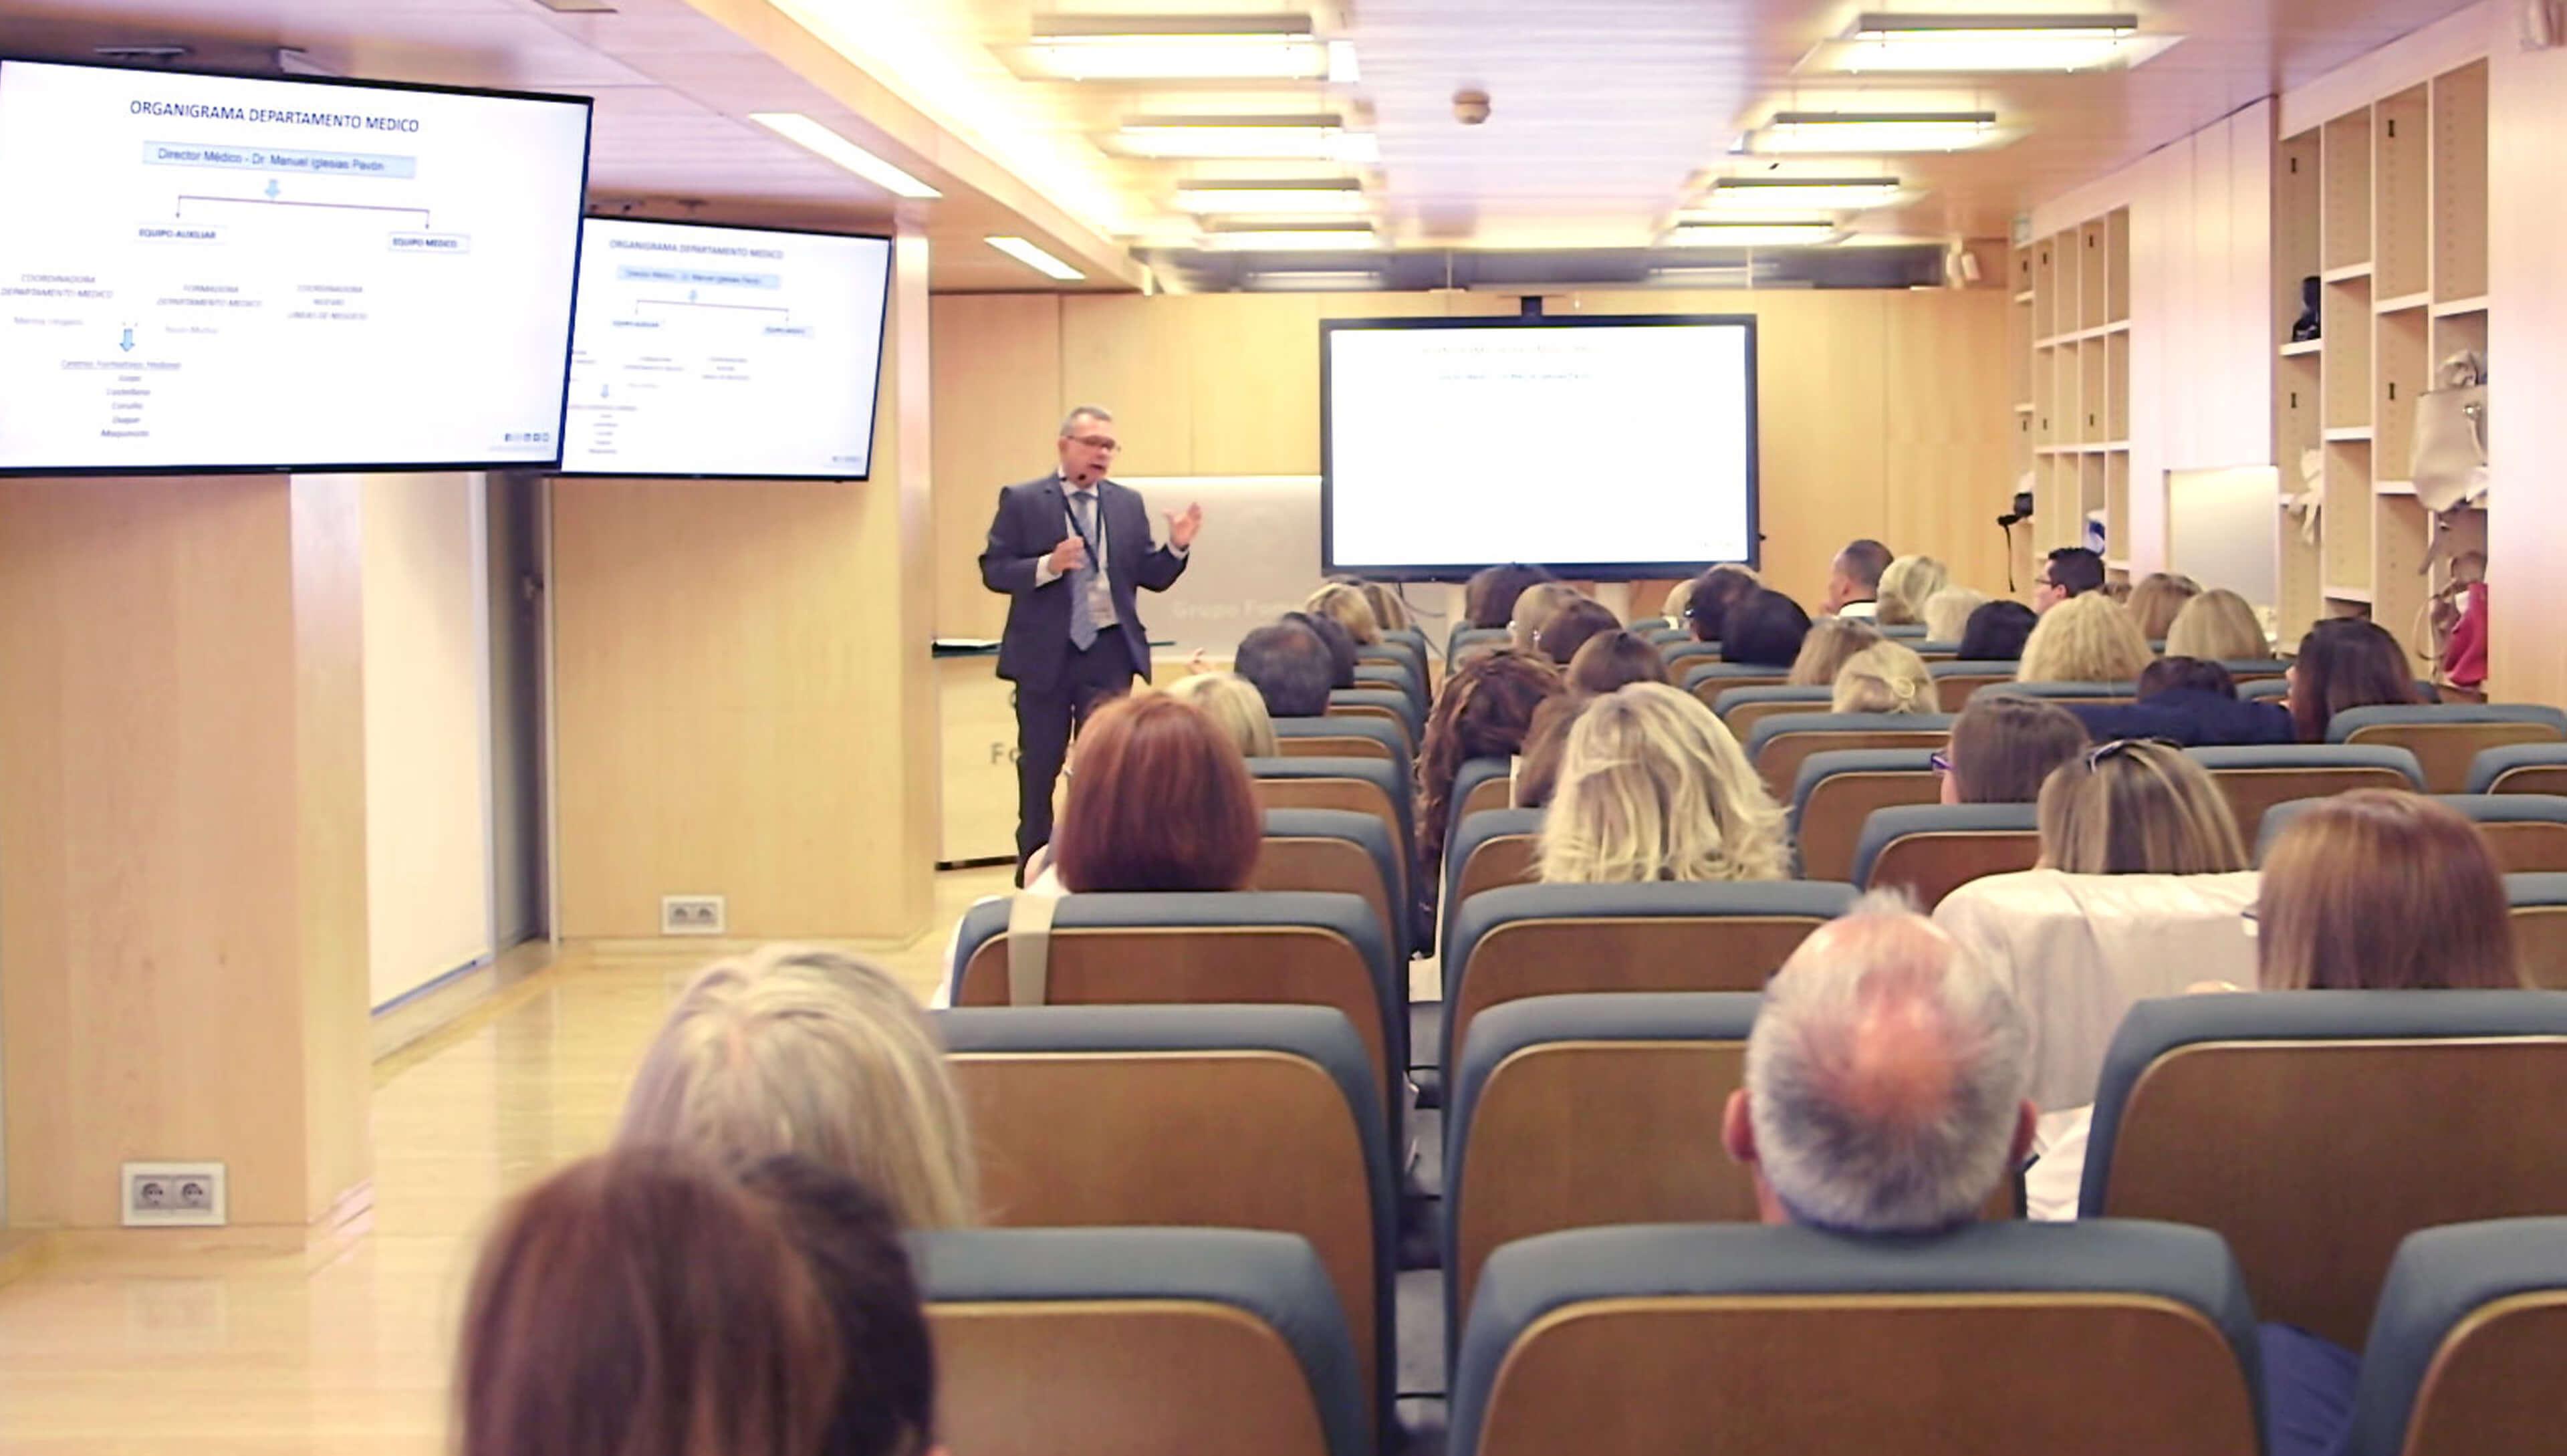 Hedonai-Symposium-Medico-2019-88